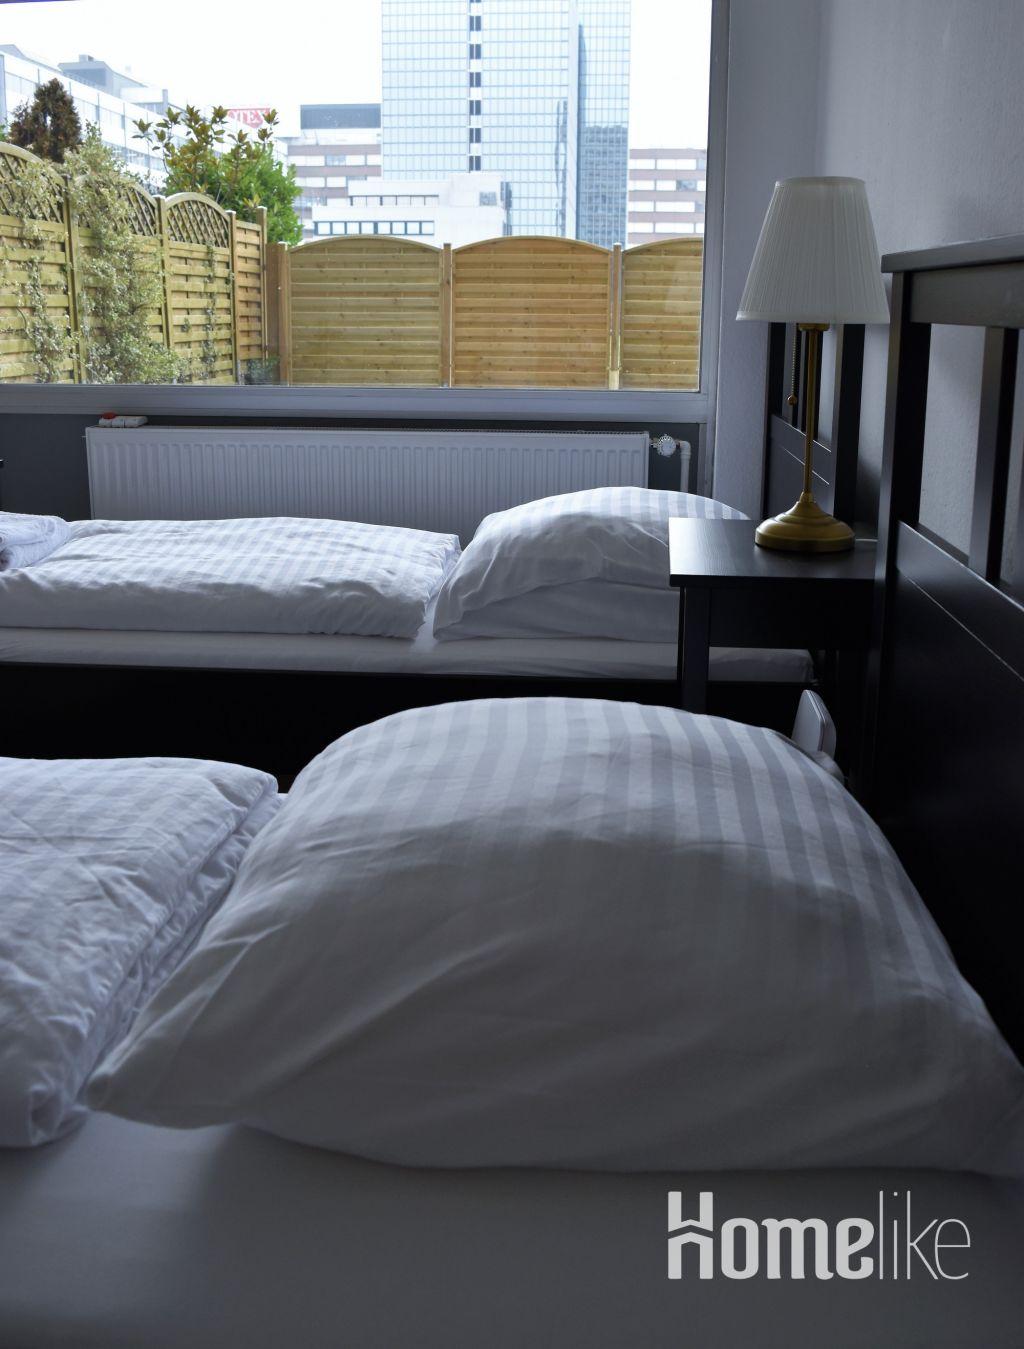 image 6 furnished 2 bedroom Apartment for rent in Neuss, Rhein-Kreis Neuss